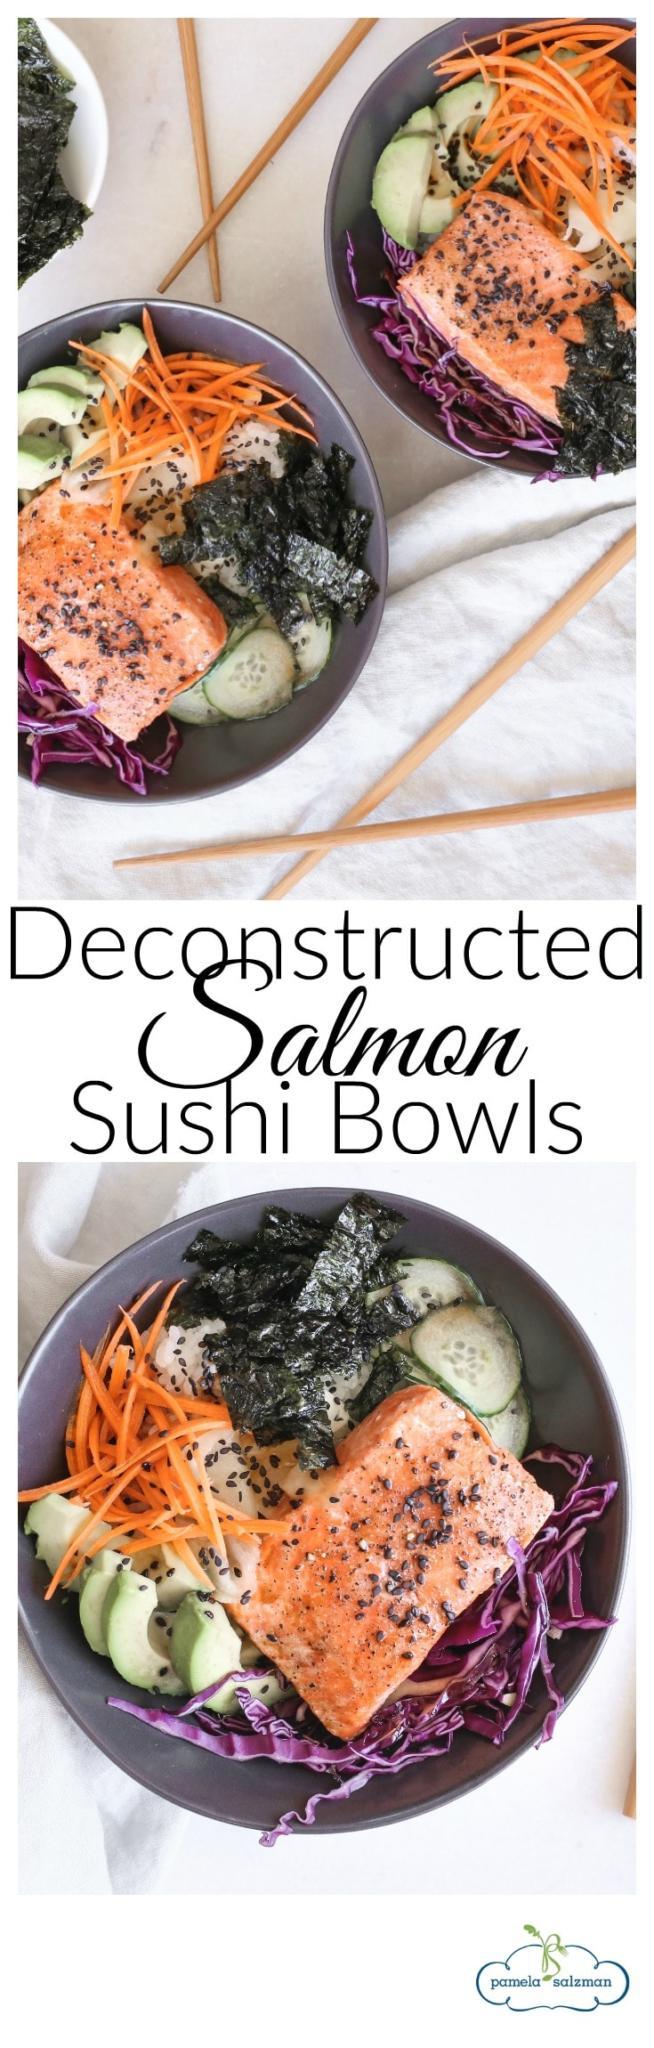 Deconstructed Salmon Sushi Bowls| Pamela Salzman